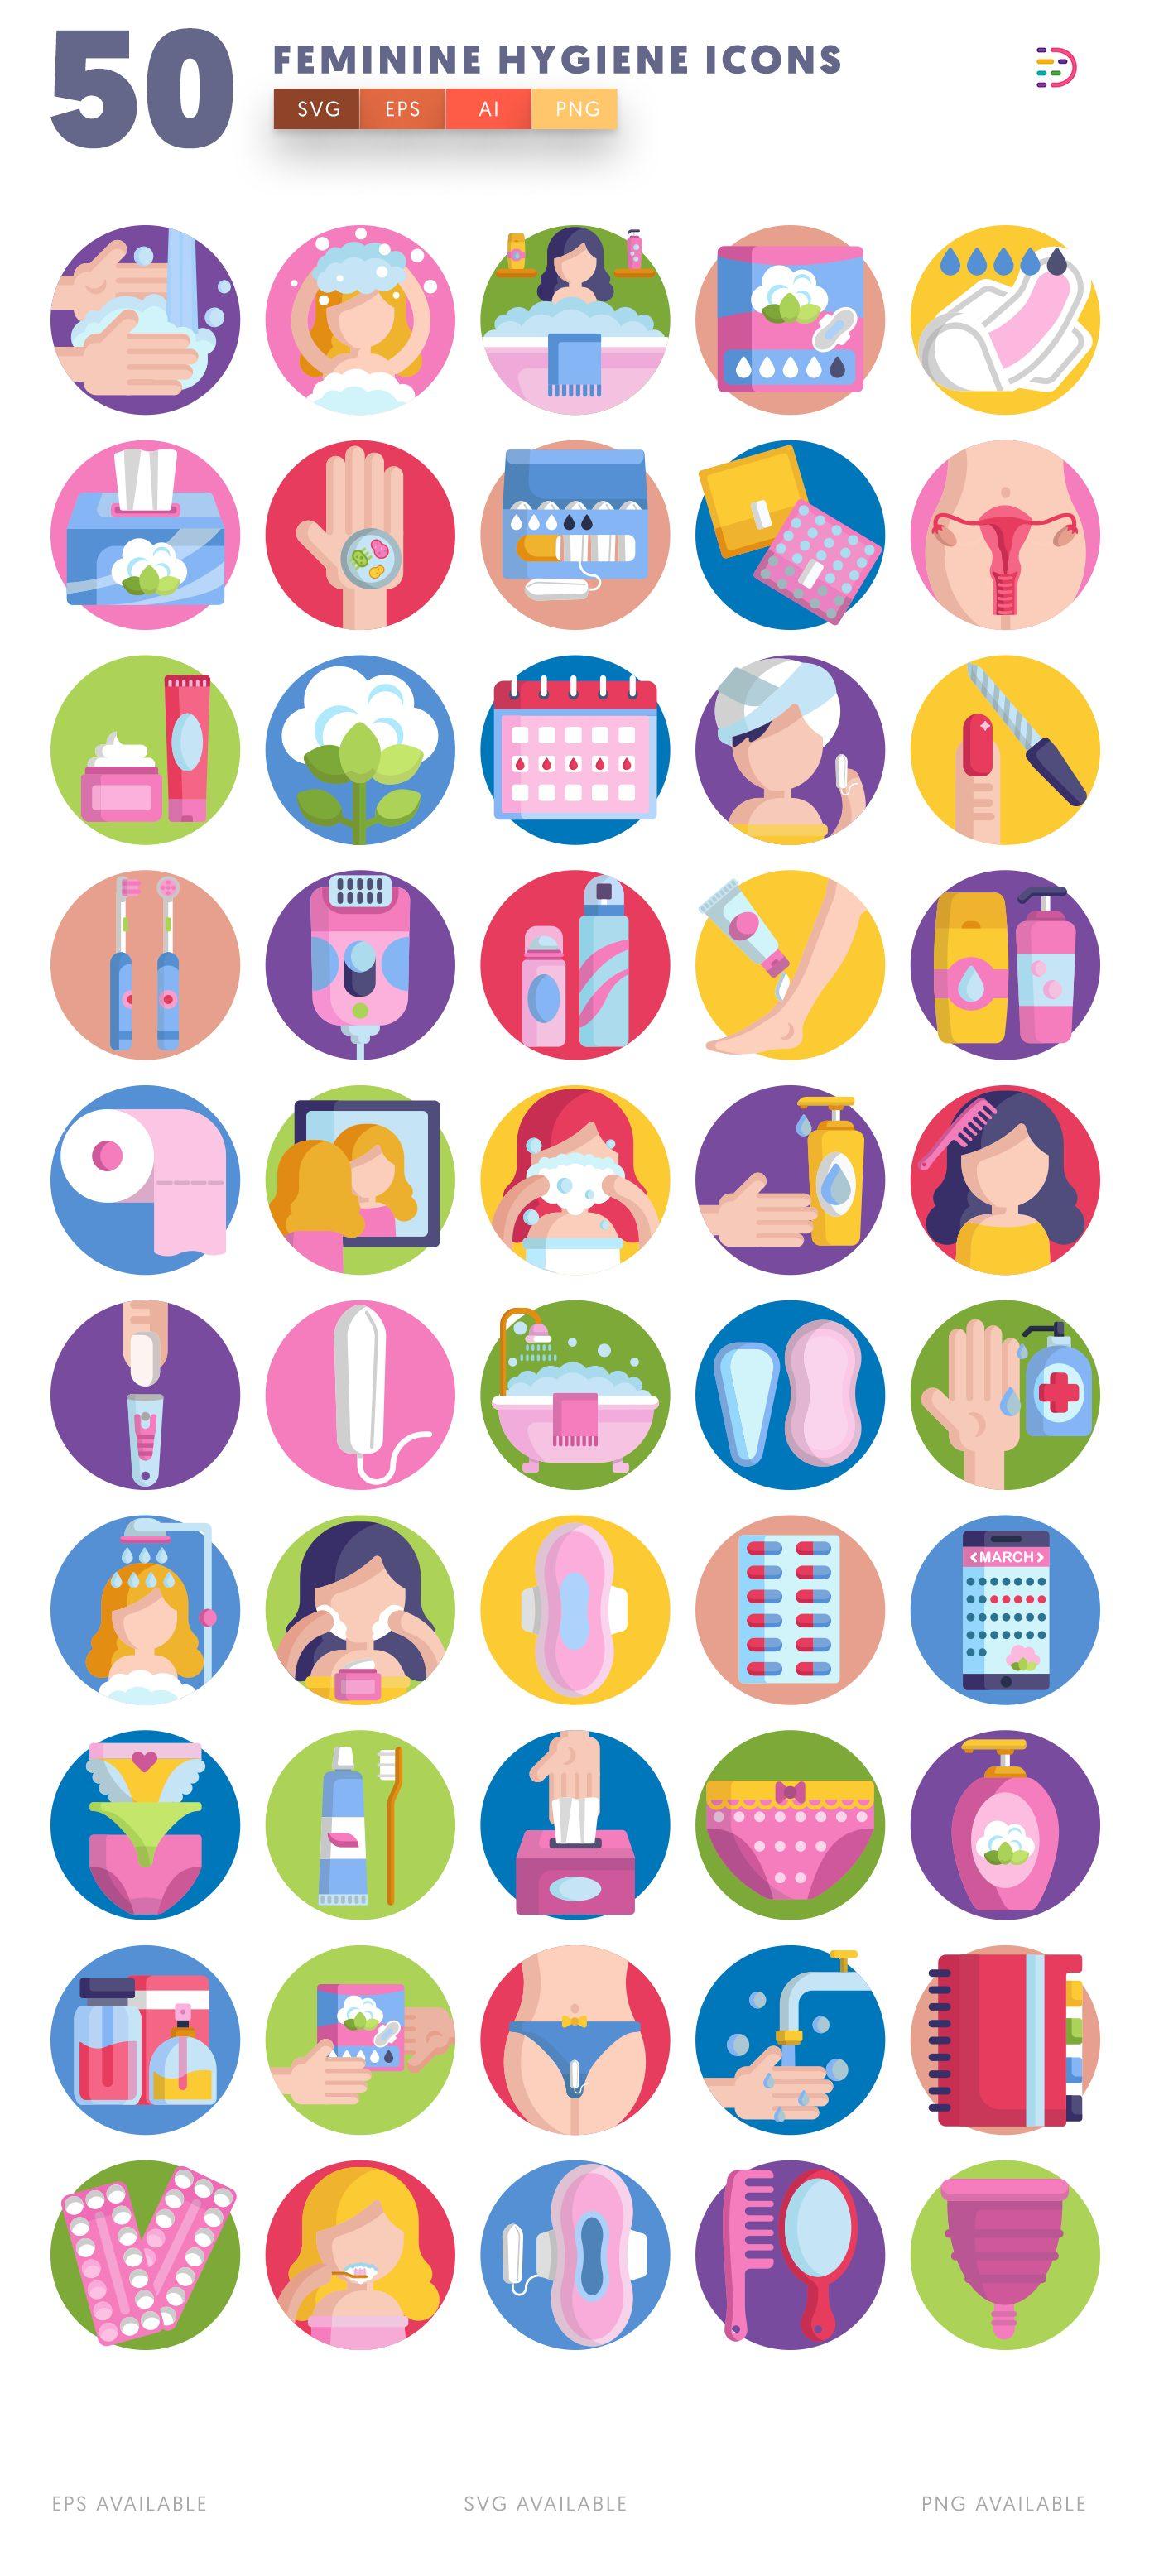 Feminine Hygiene icon pack